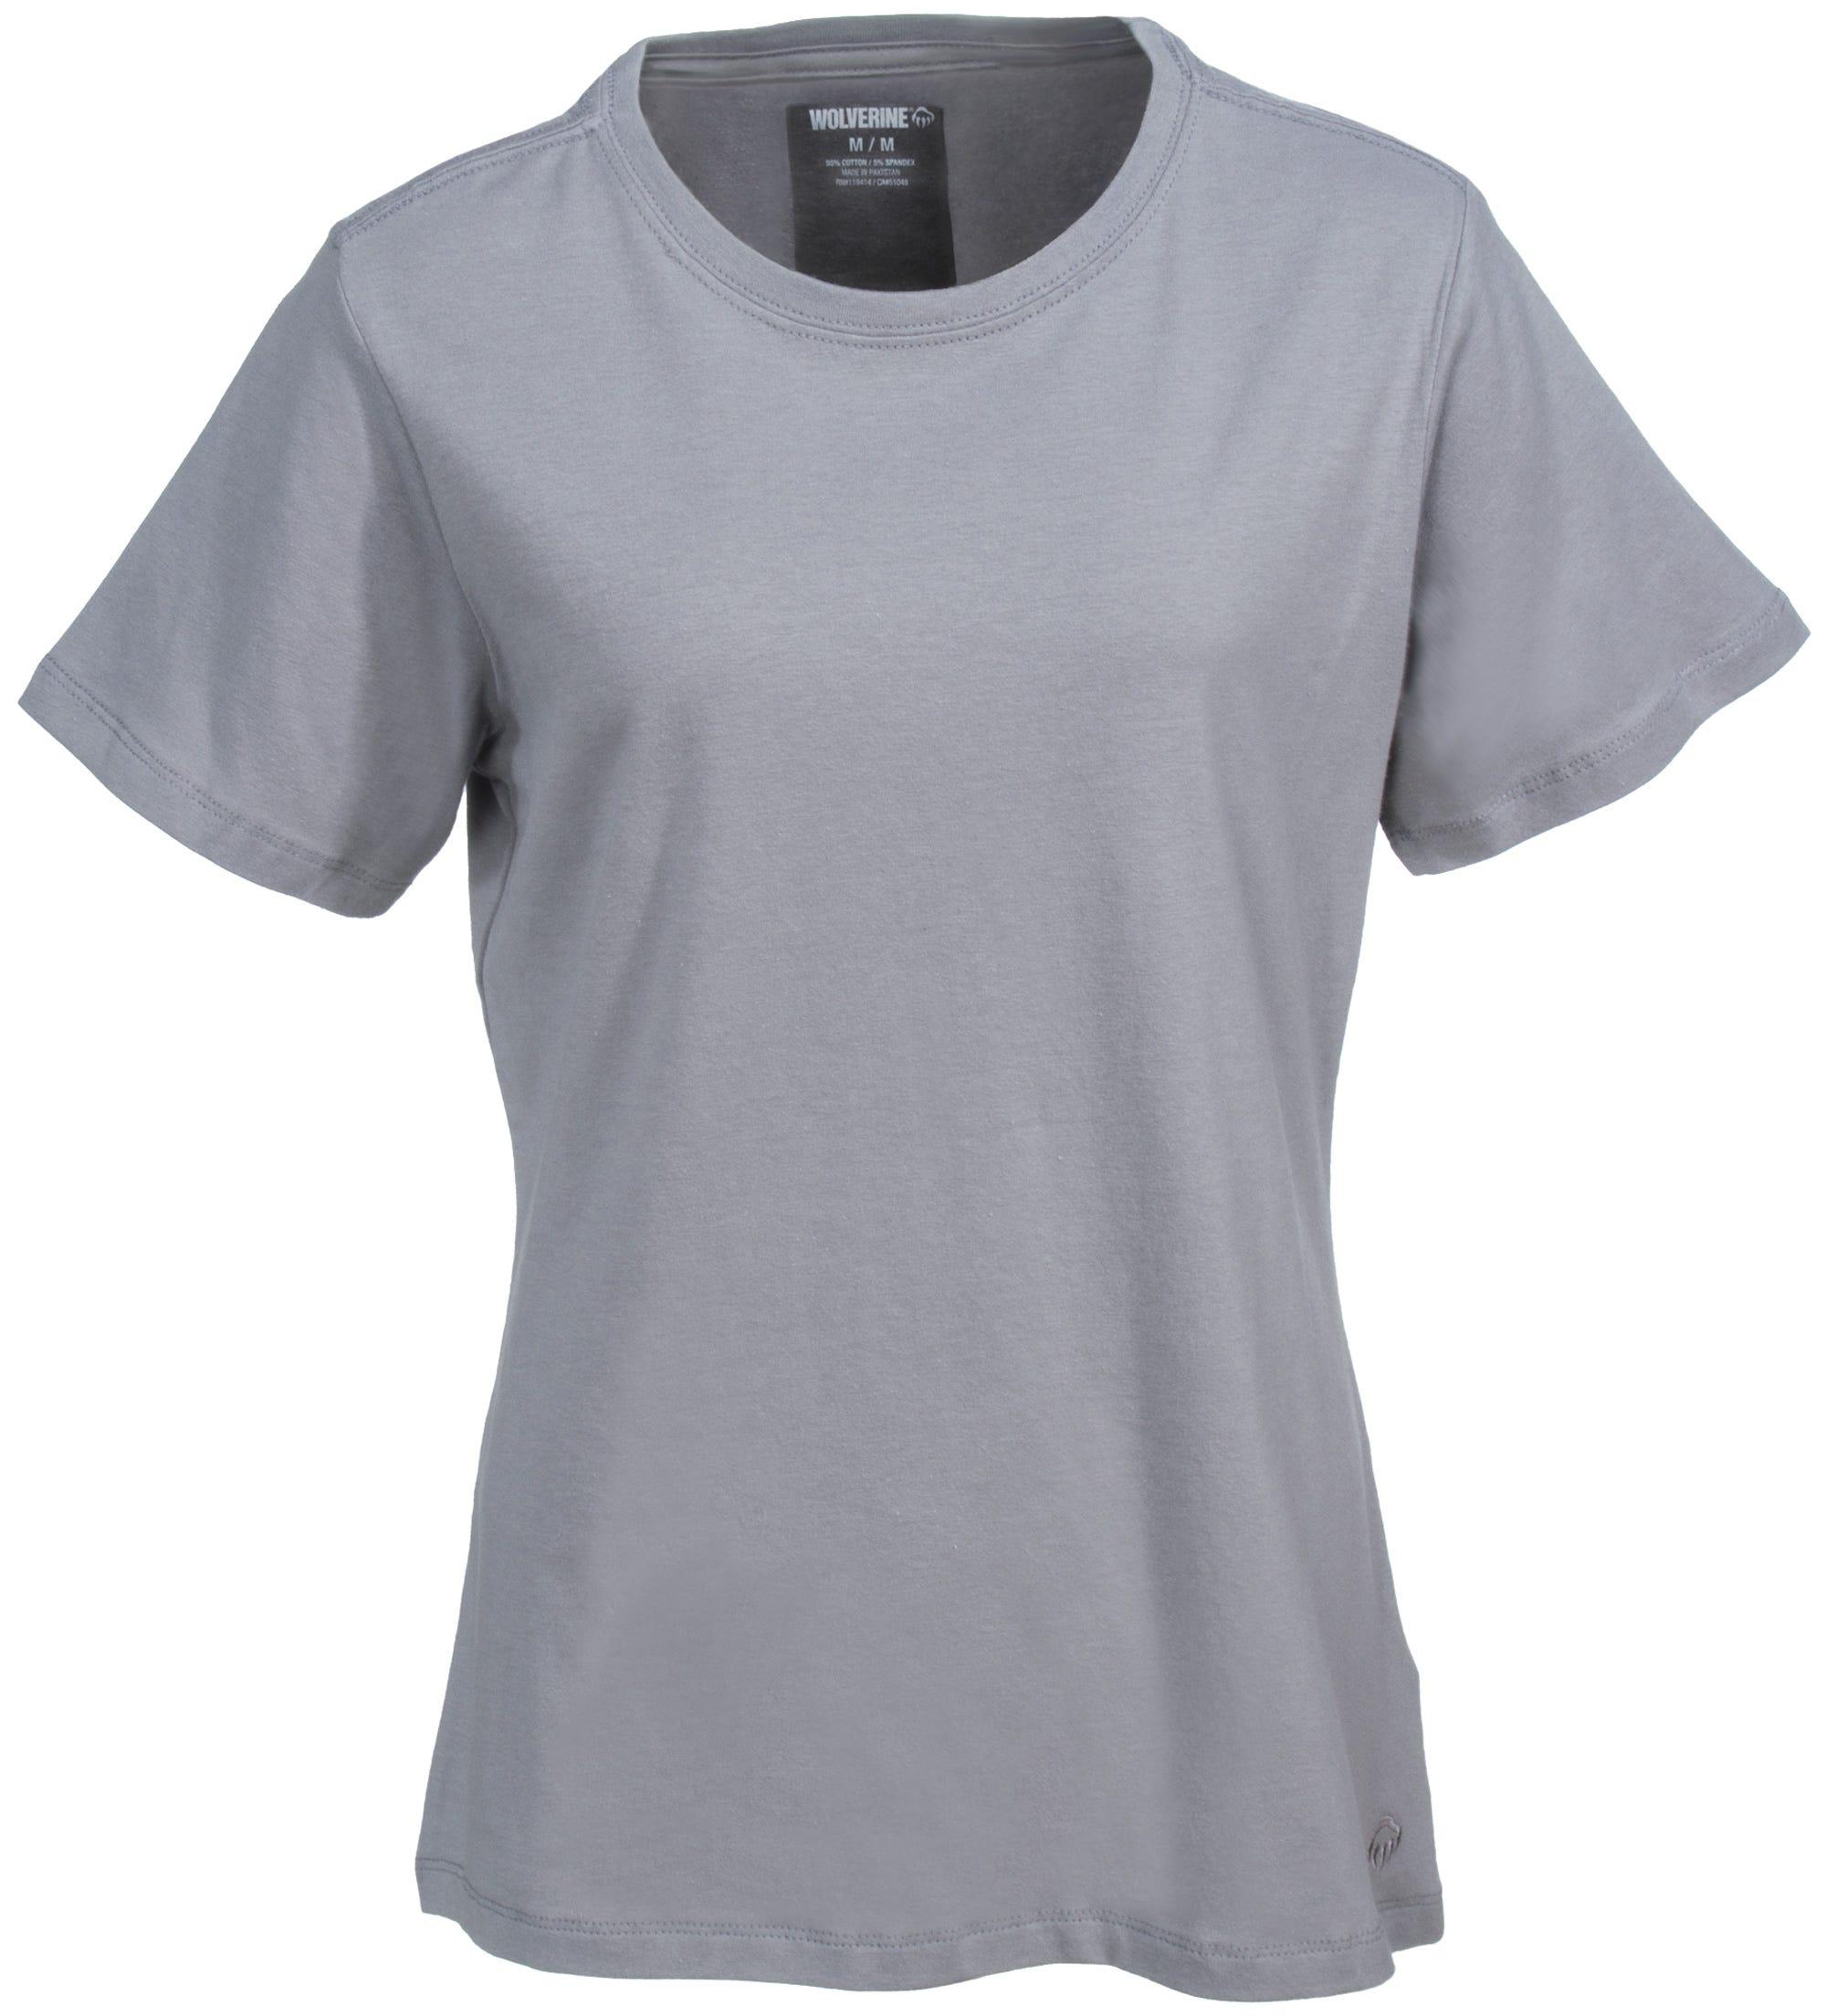 Wolverine Women's W1204570 028 Grey Short Sleeve Lena Tee Shirt